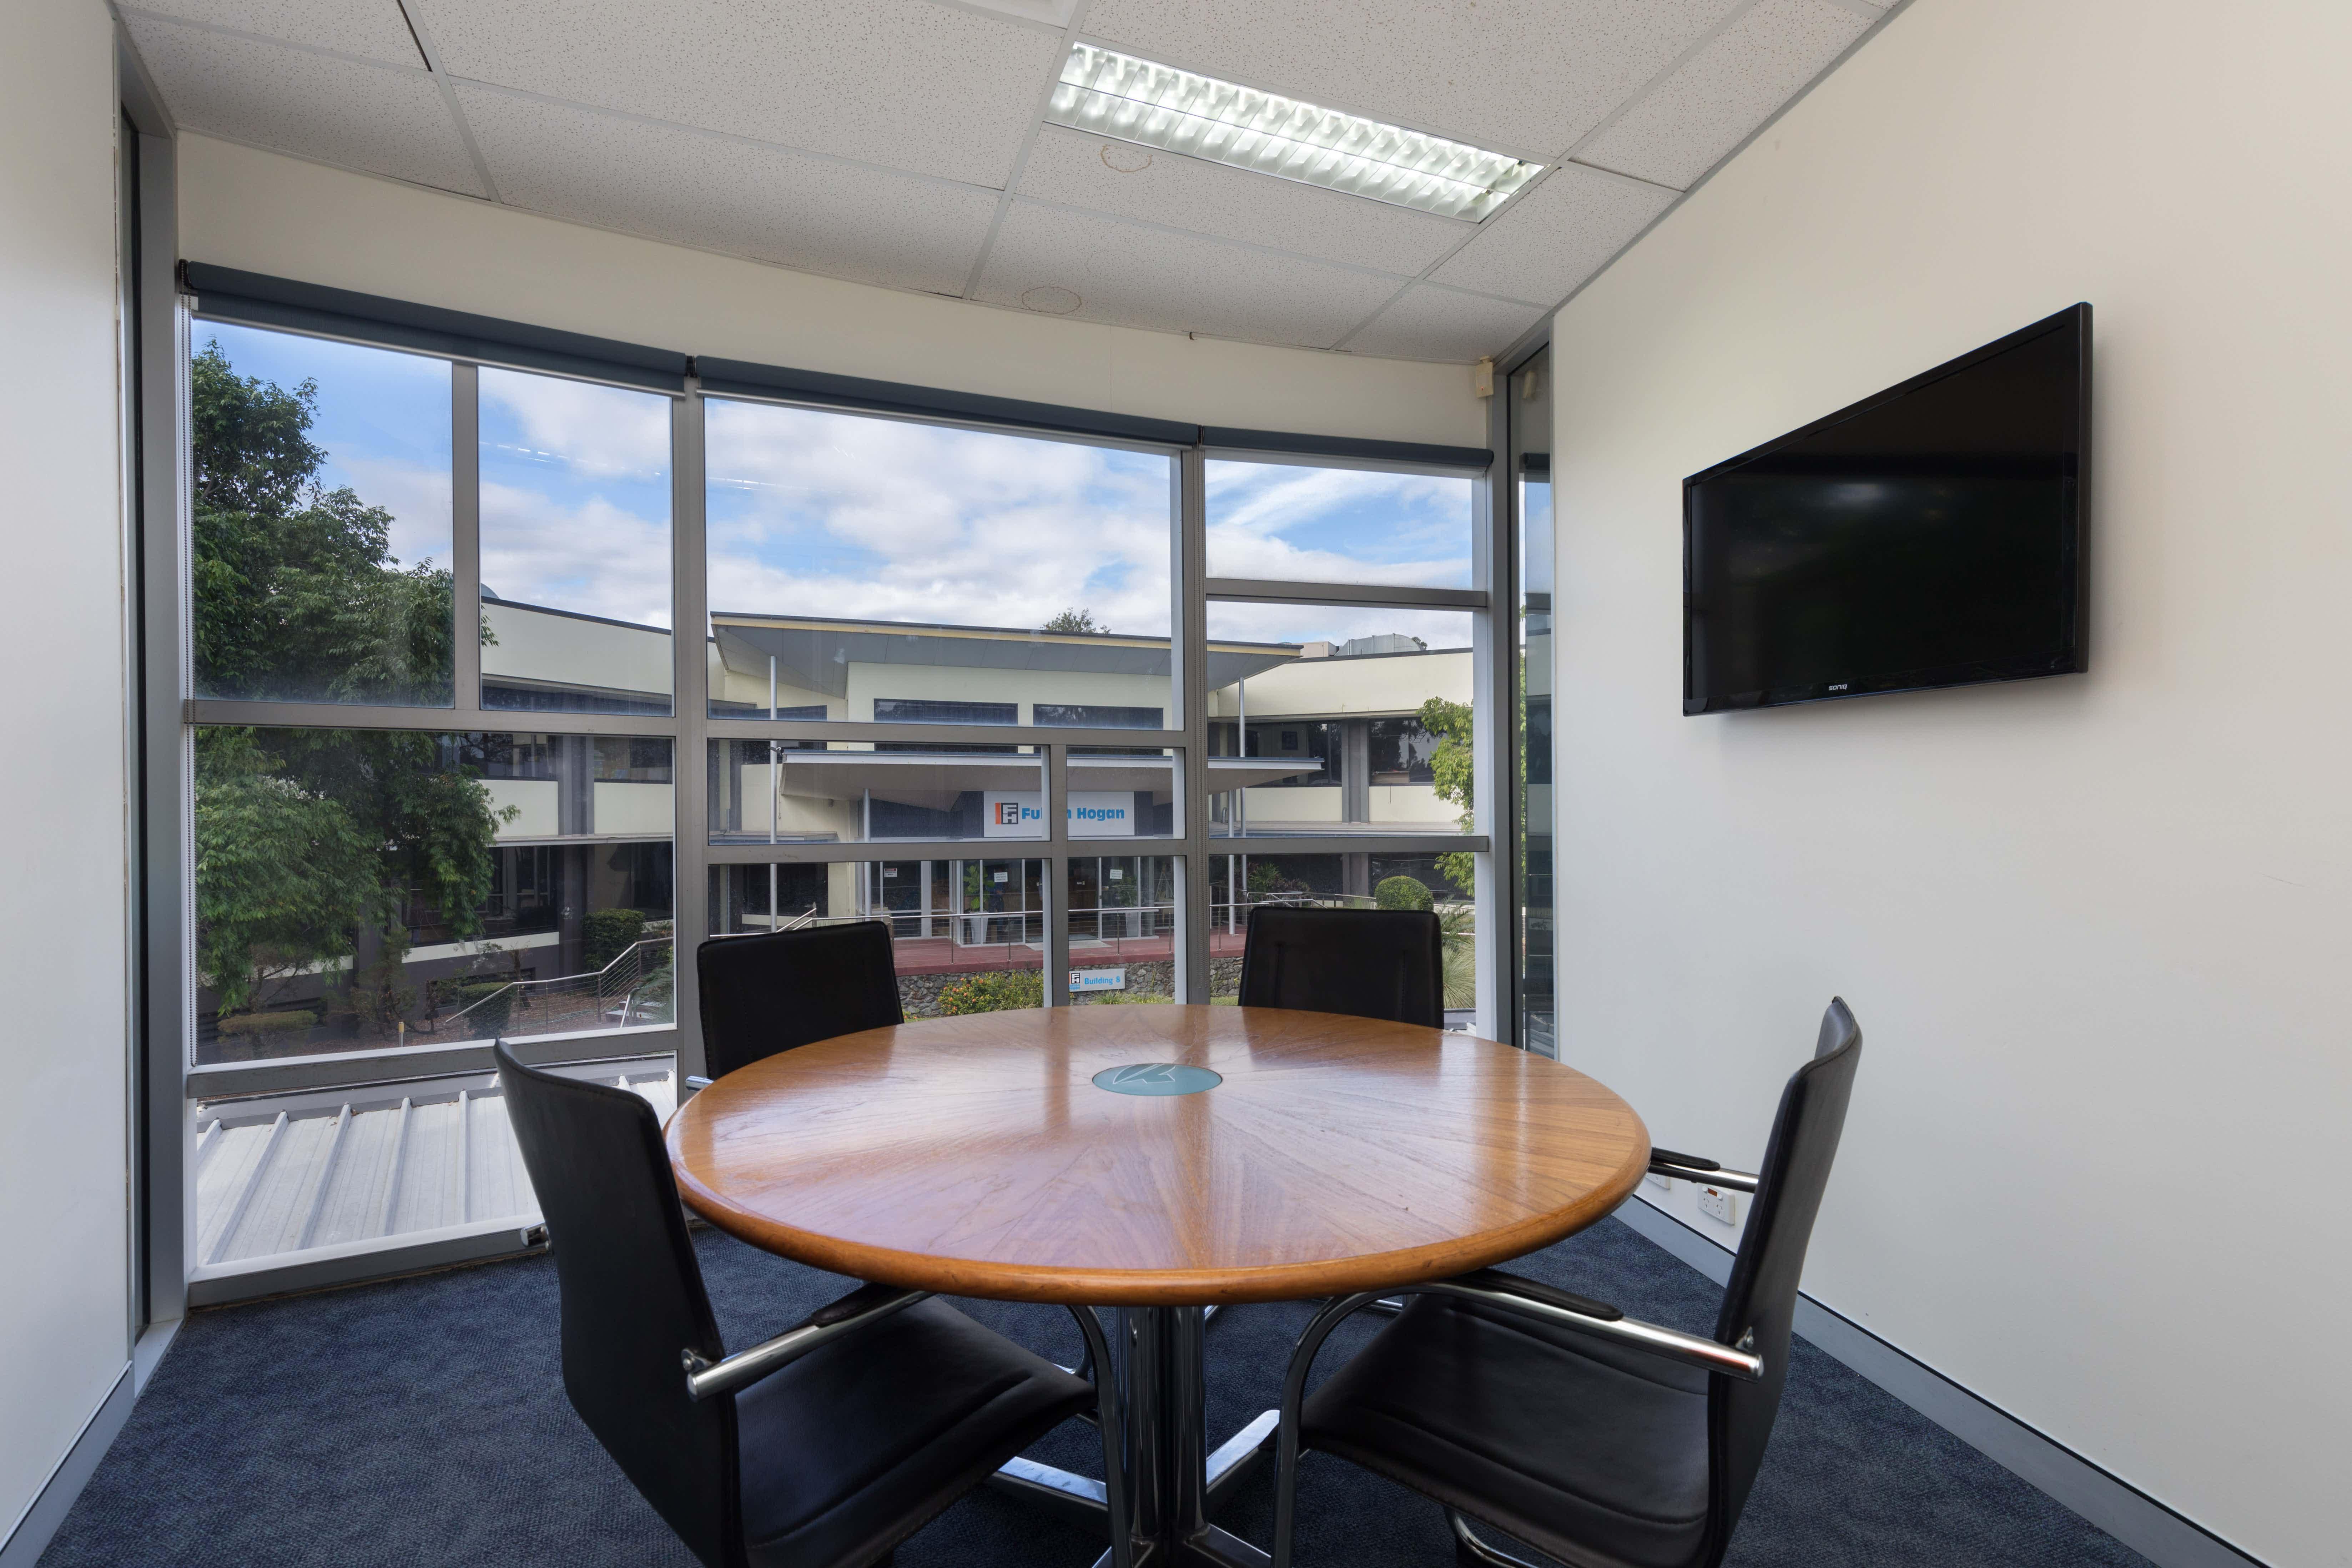 Meeting Room, Corporate House - Garden City